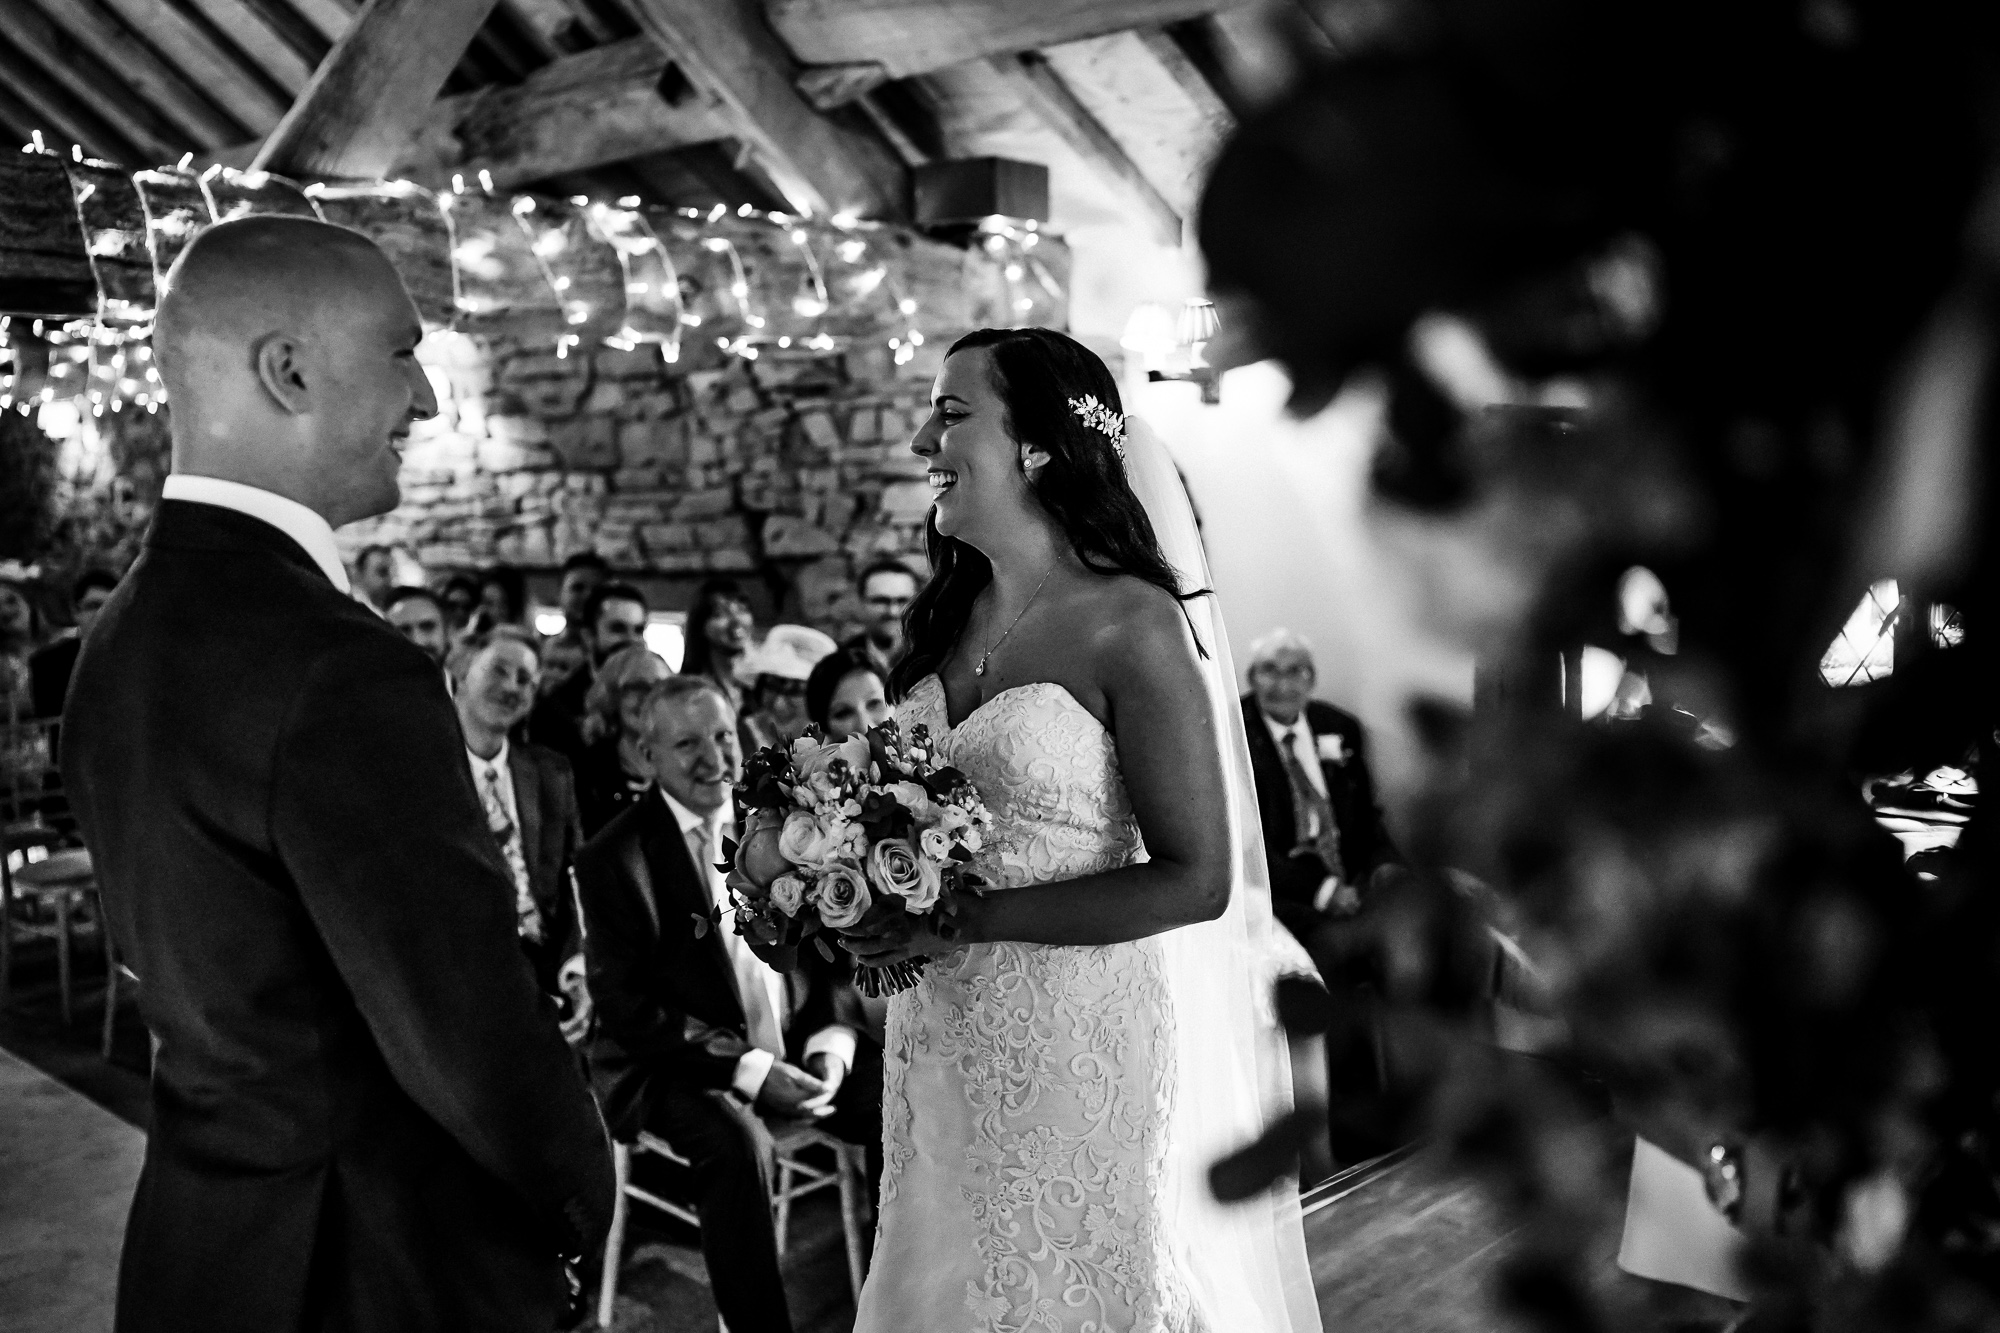 Hyde Bank Farm Wedding Photography Manchester wedding photographer (23 of 49).jpg